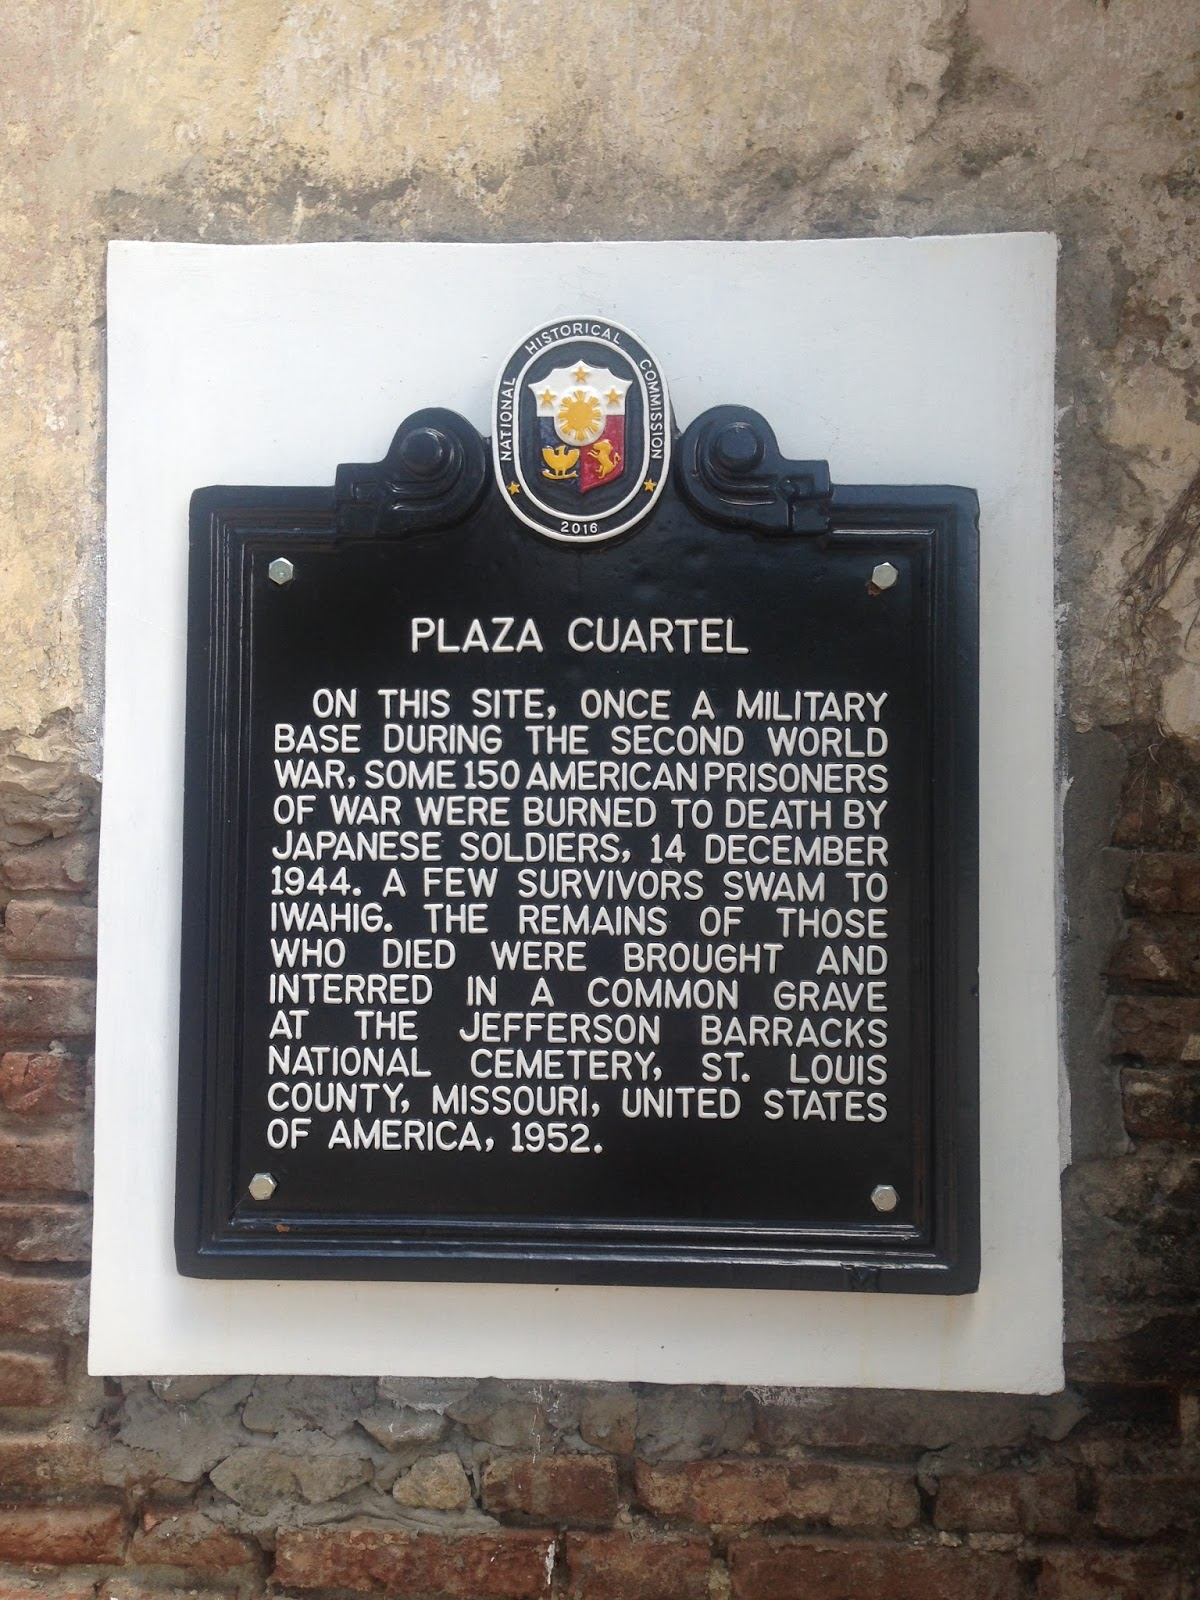 History of Plaza Cuartel